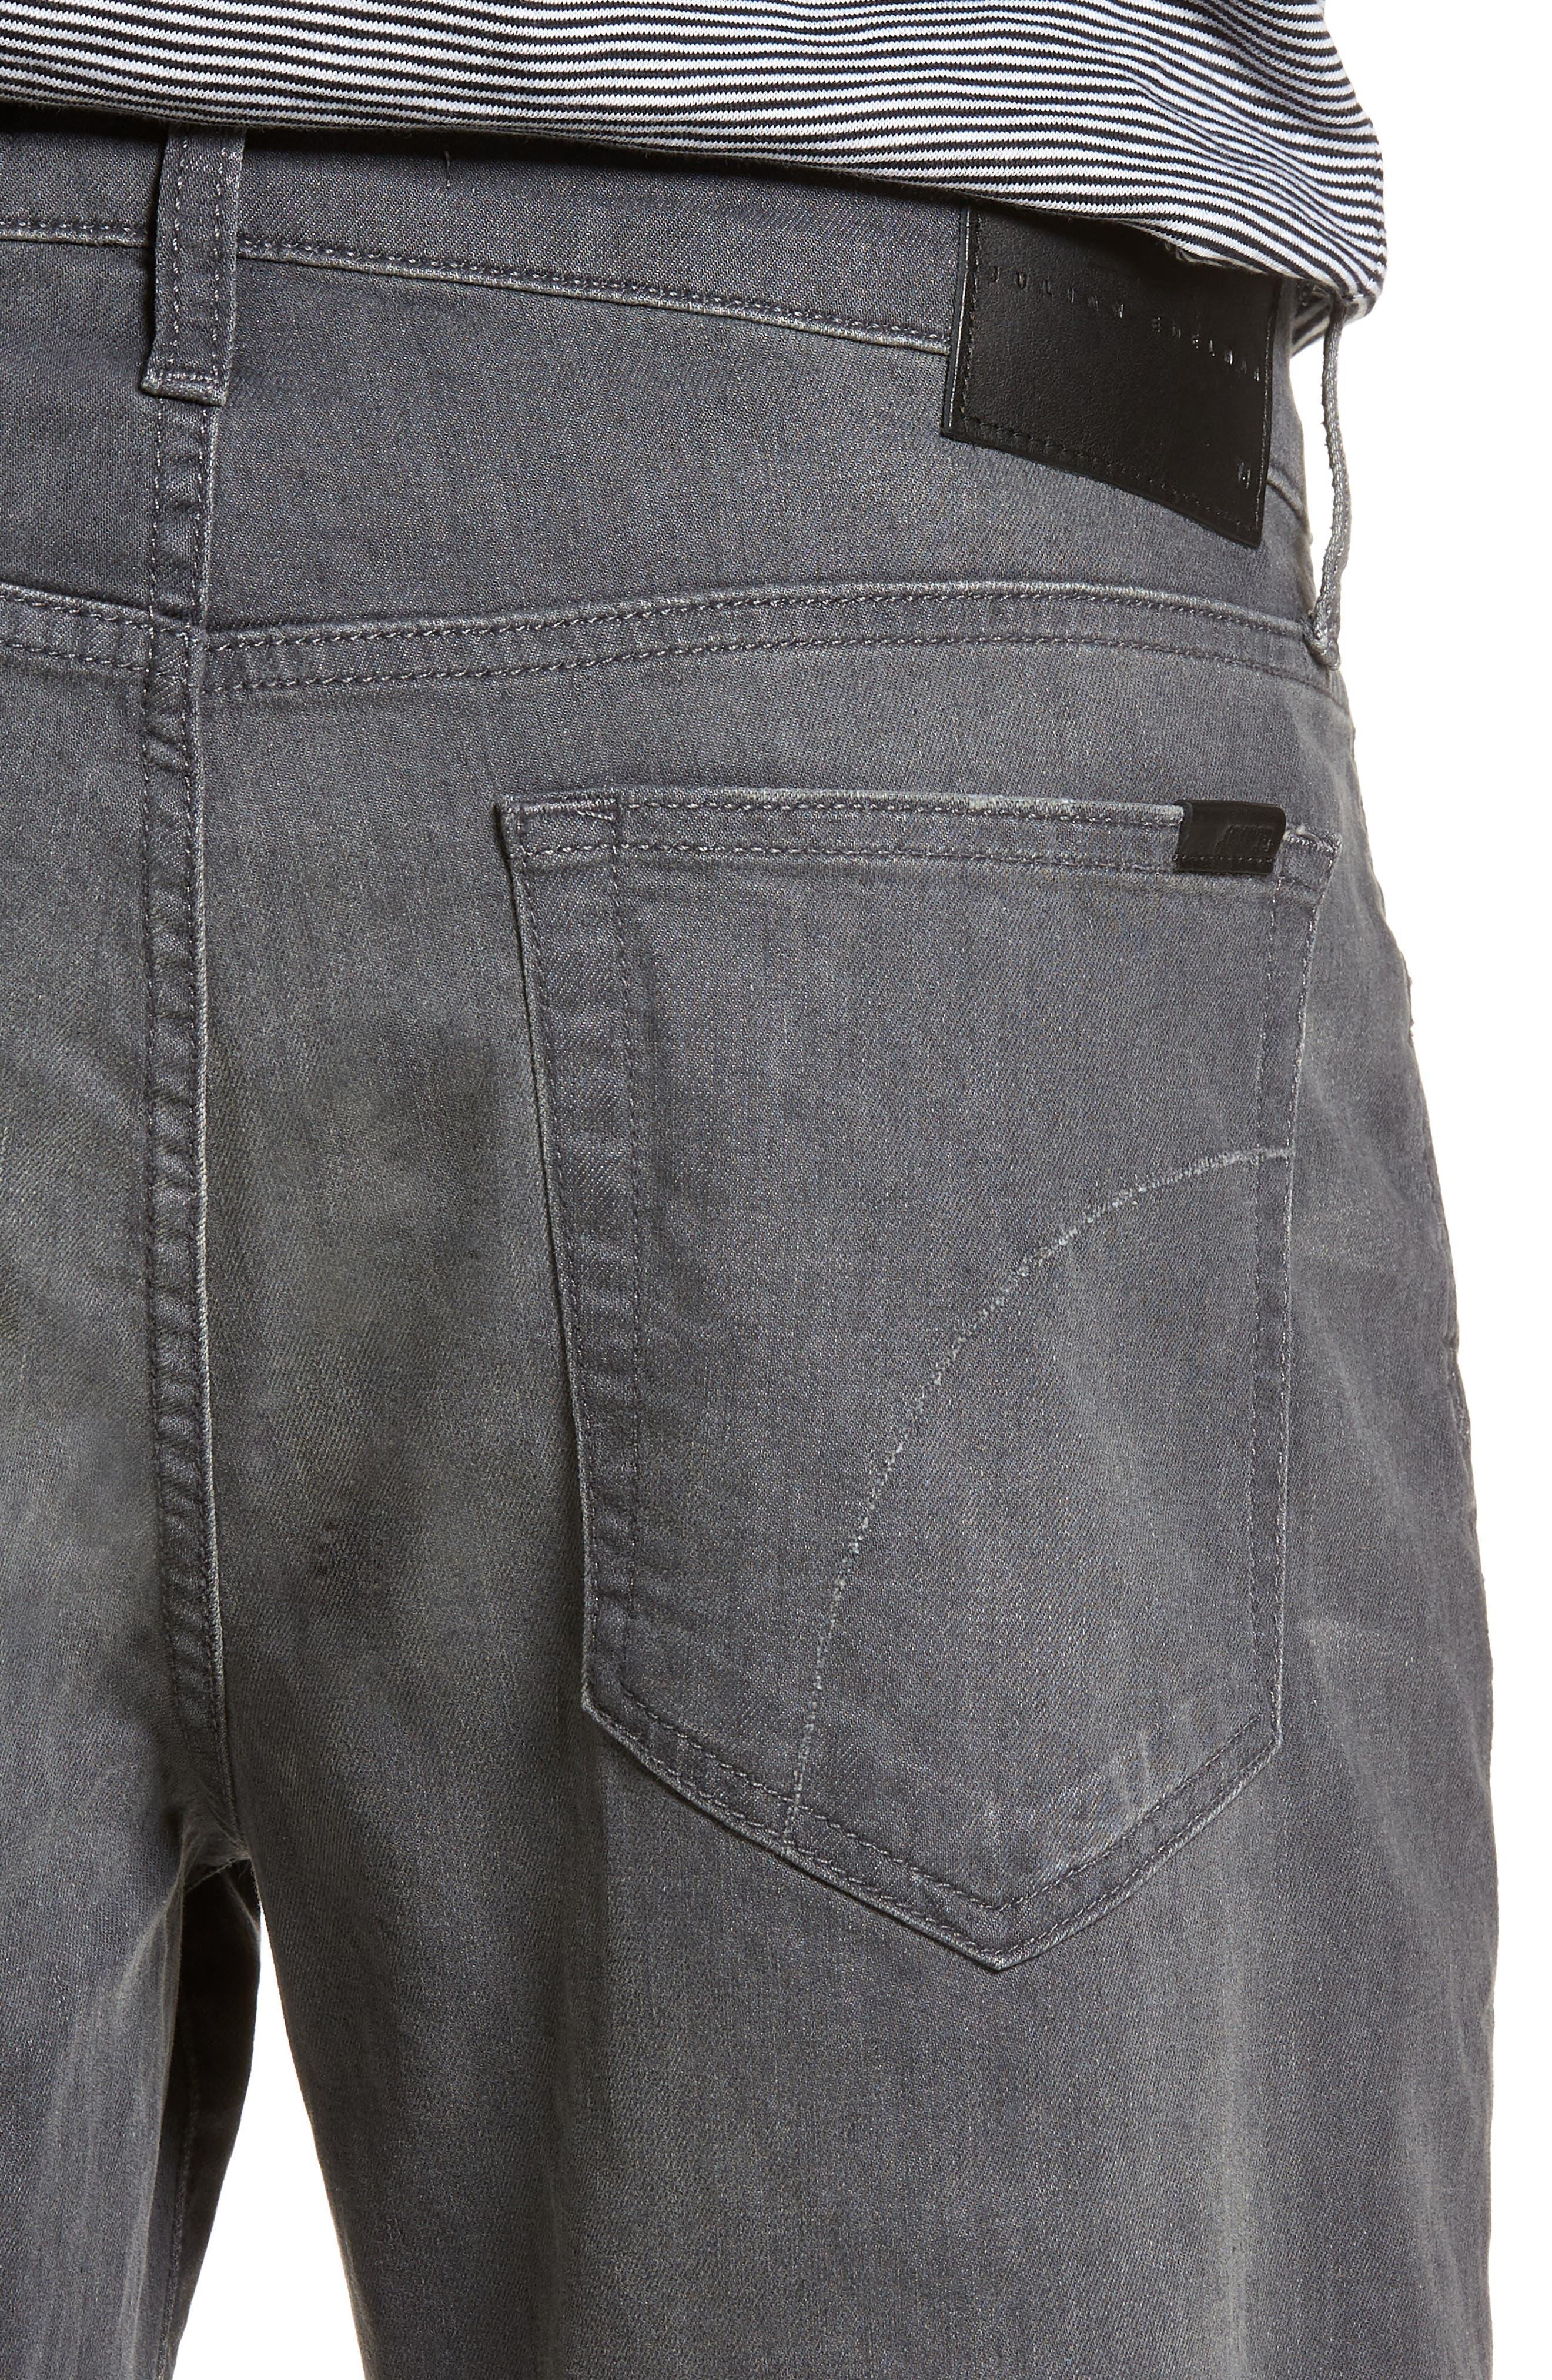 Folsom Athletic Slim Fit Jeans,                             Alternate thumbnail 4, color,                             Julian